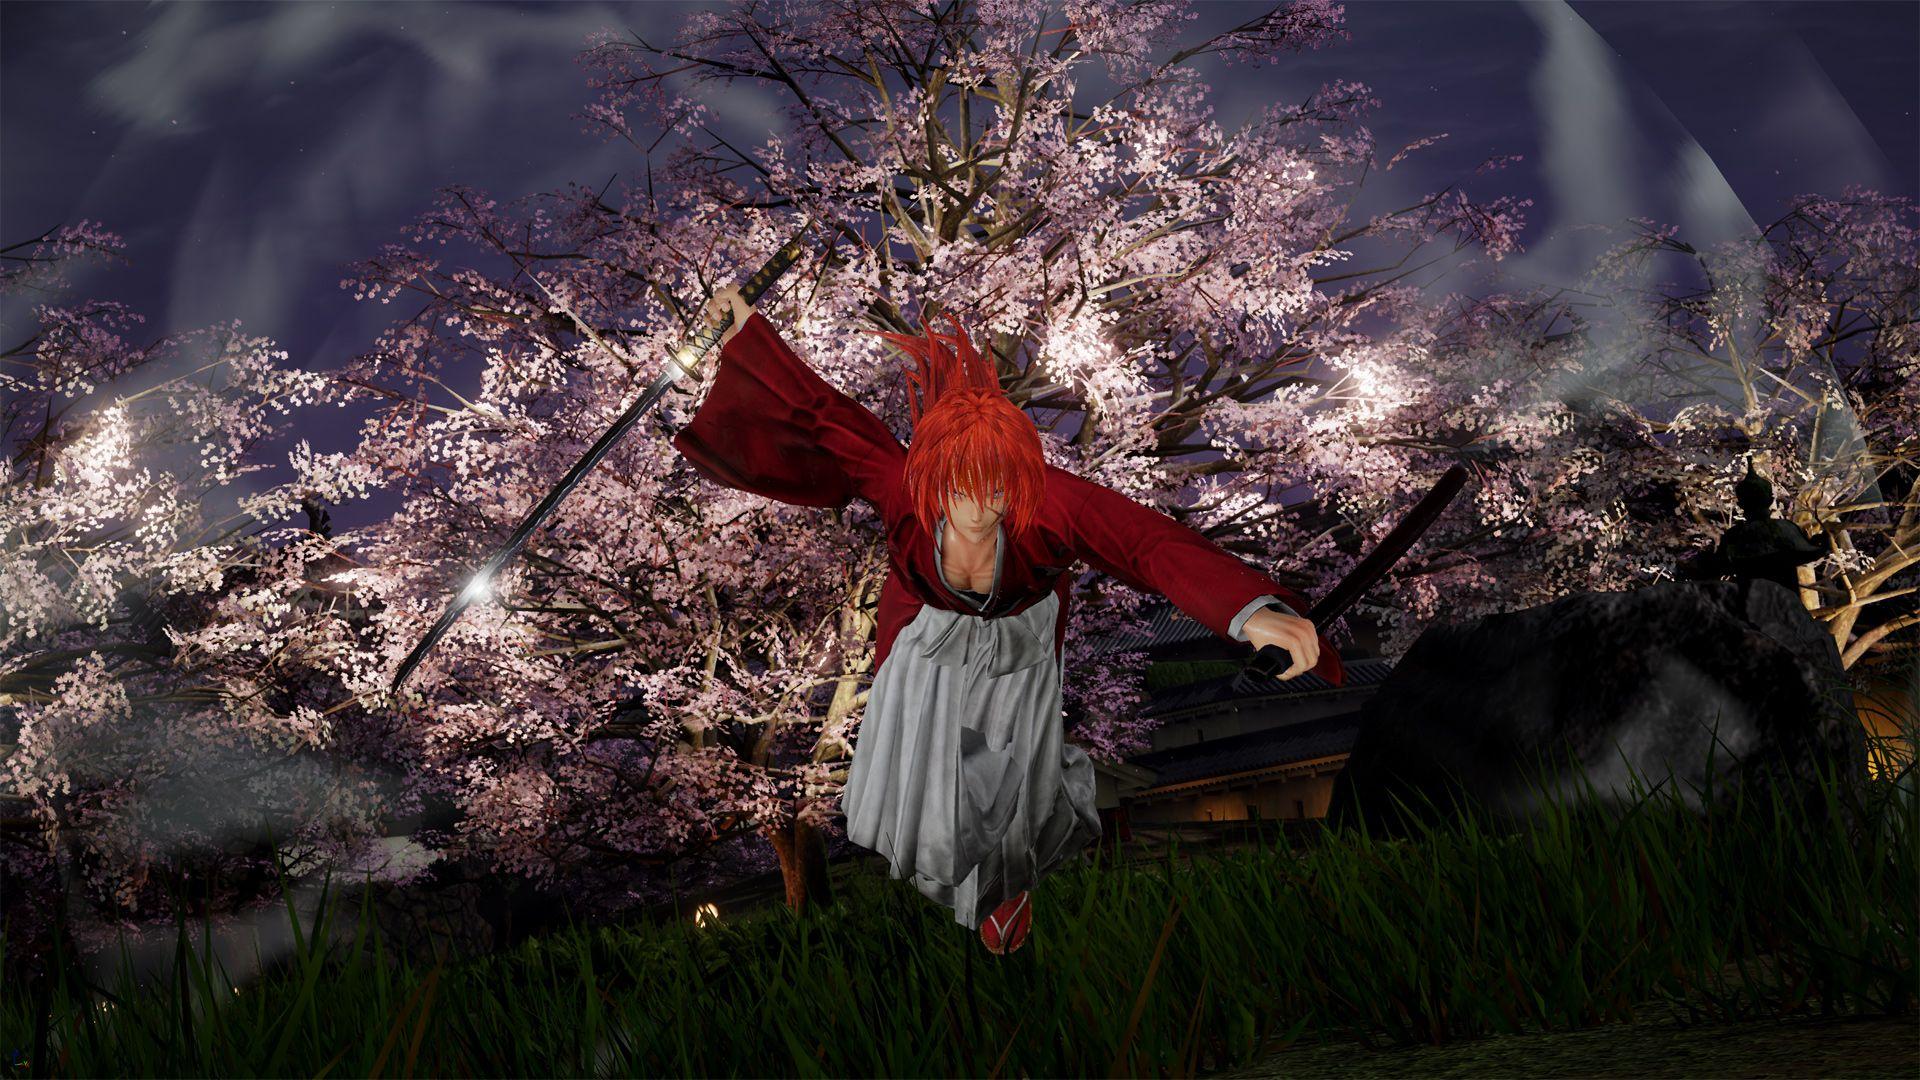 Un screenshot montrant Kenshin fonçant vers la caméra sabre en main, avec un cerisier en fleurs dans le dos.